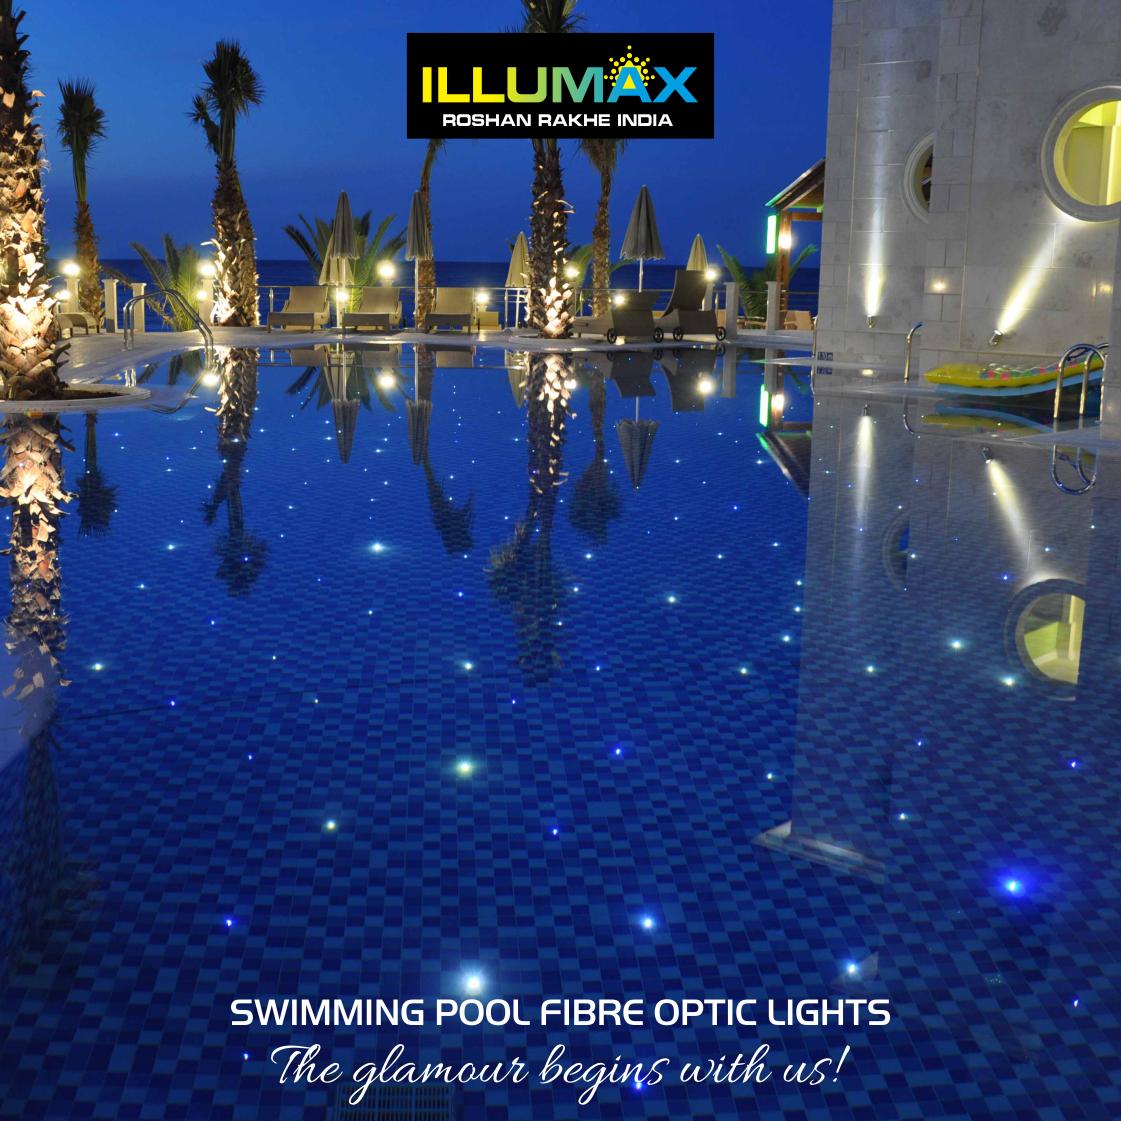 Swimming Pool Fibre Optic Lights The Glamour Begins With Us Fiberopticlights Fiberopticlightsmanufacturersupplierandexporterinmumbaiindia Visit